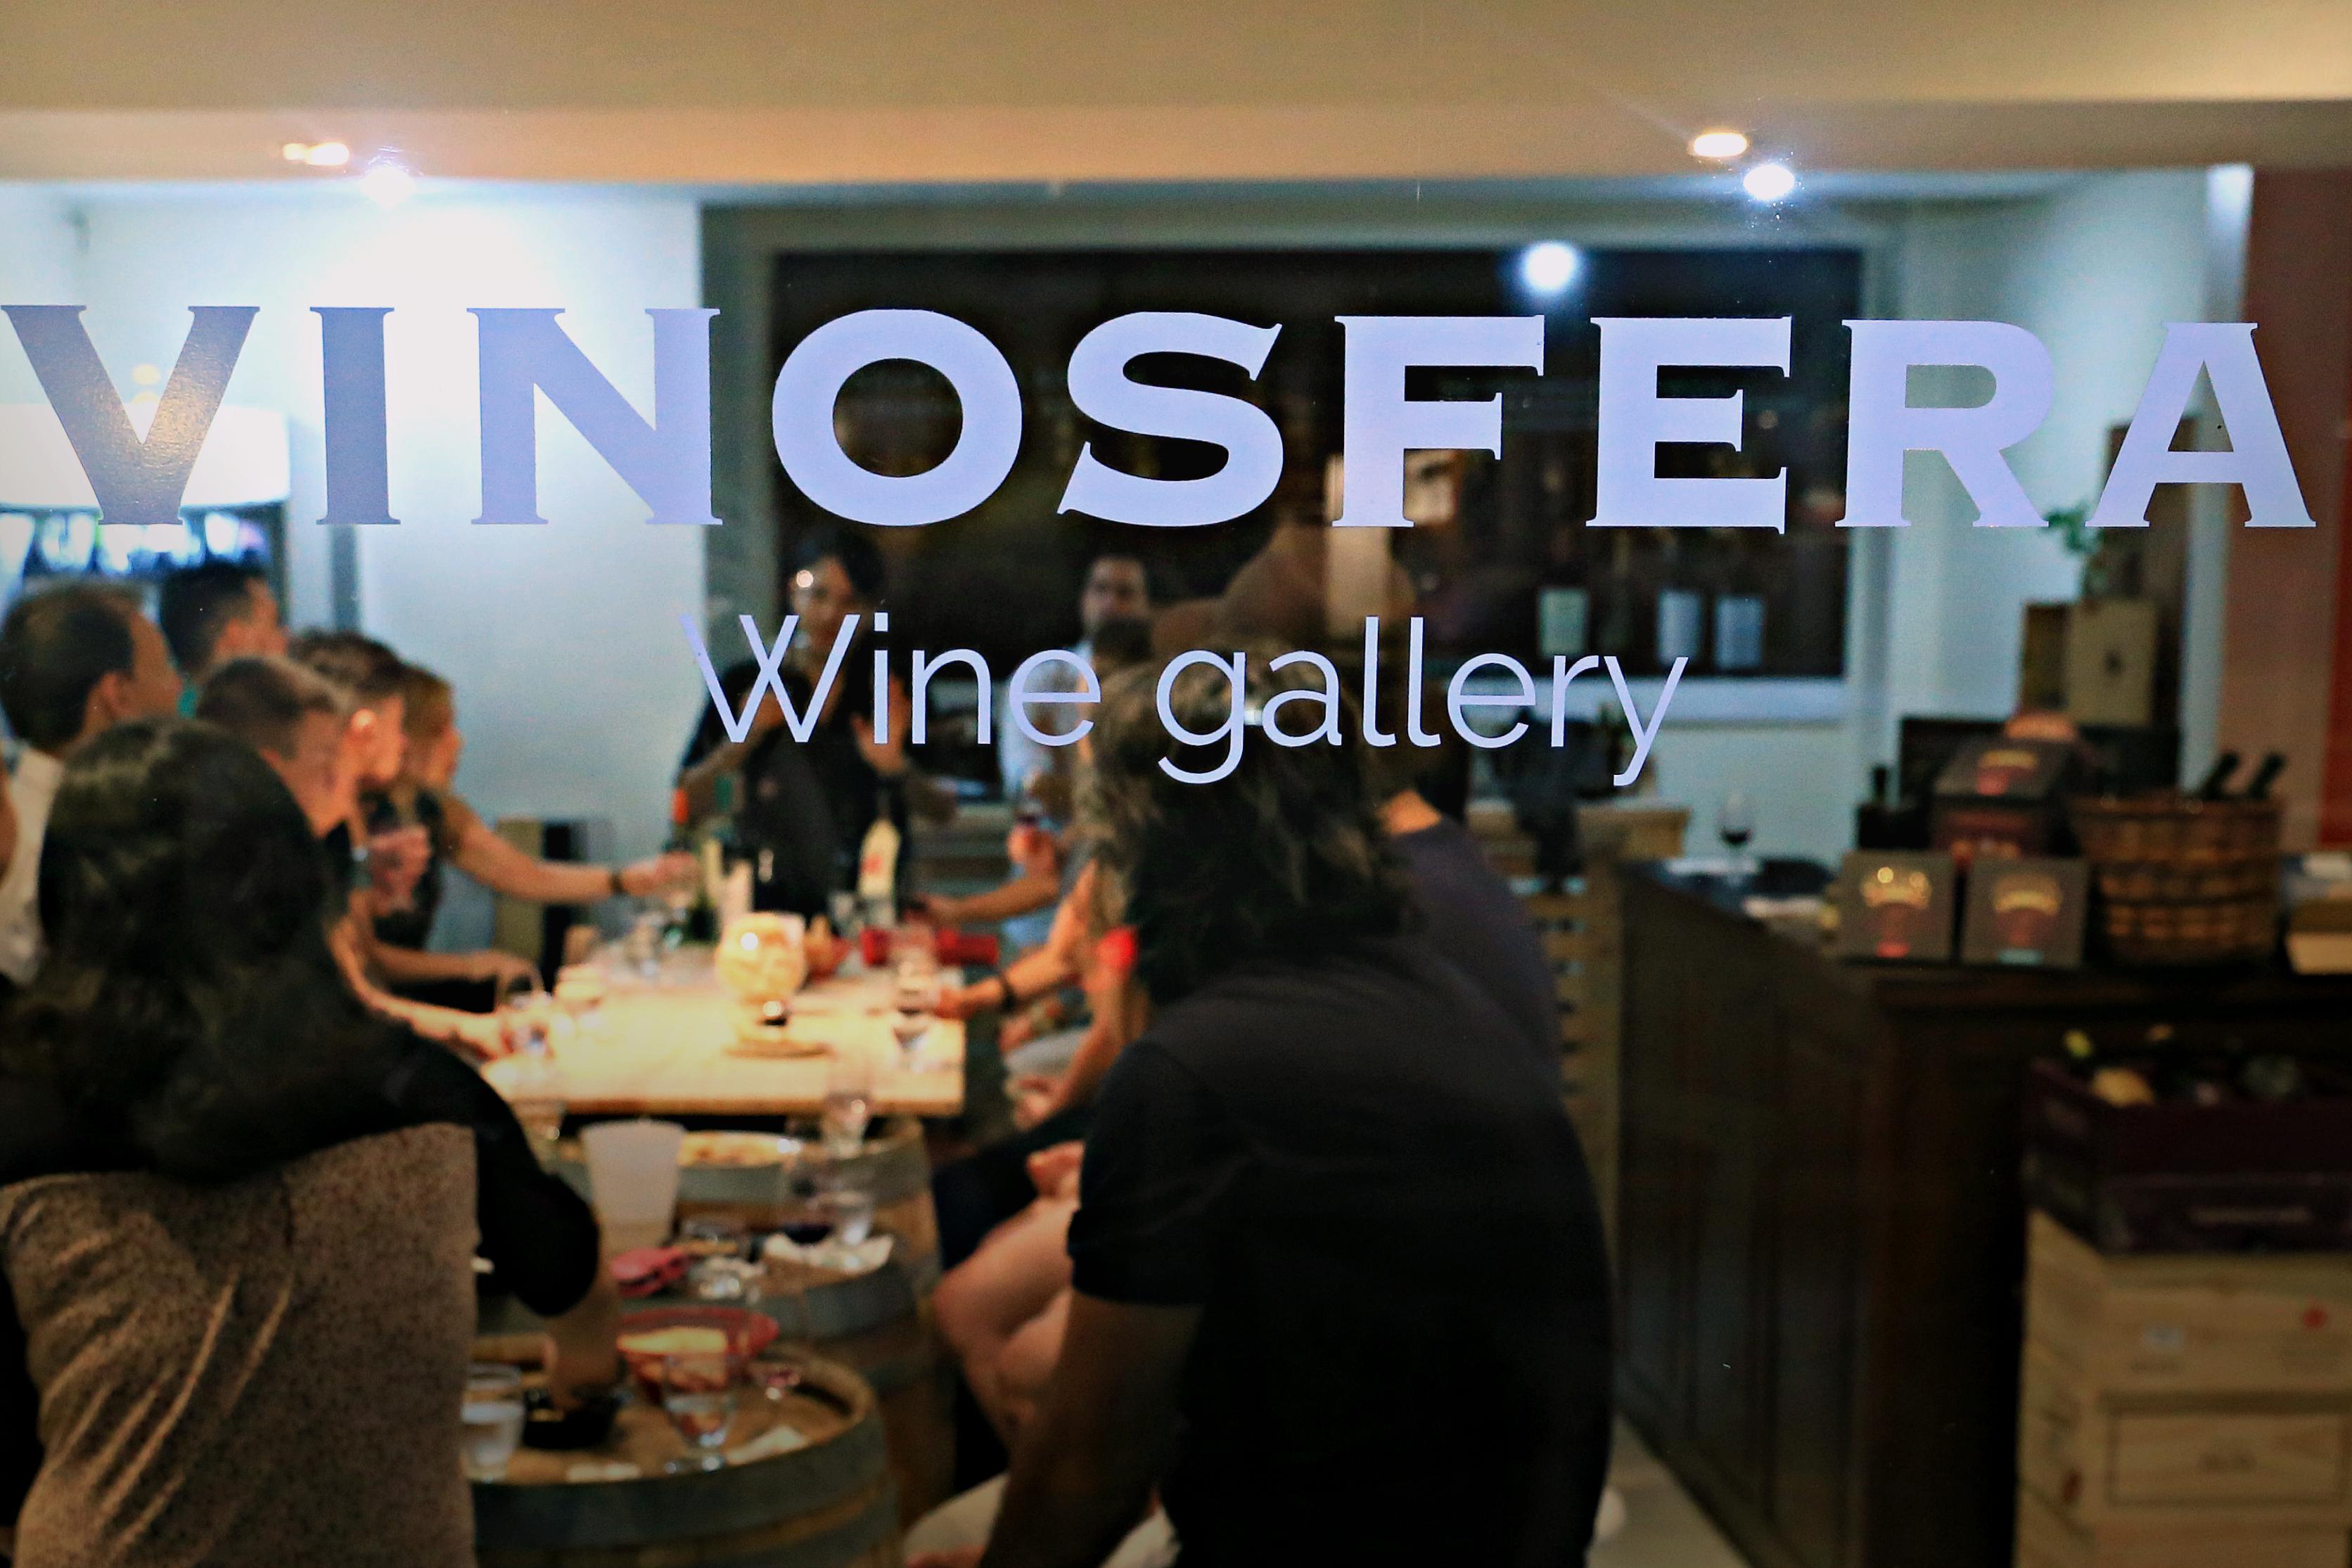 Vinosfera Wine Gallery